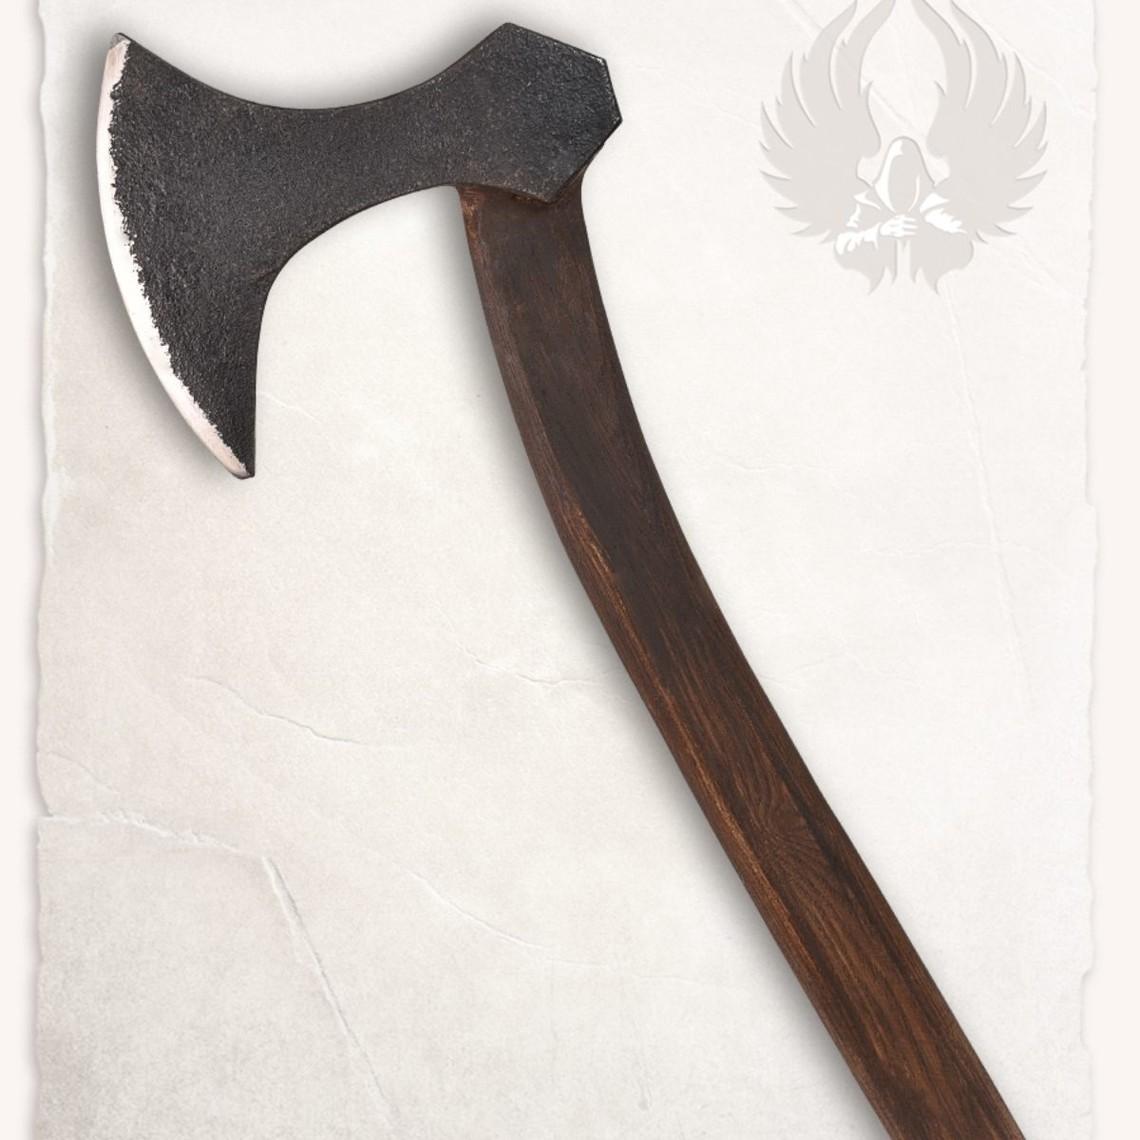 Mytholon Viking økse Ørnulf, kamp-klar